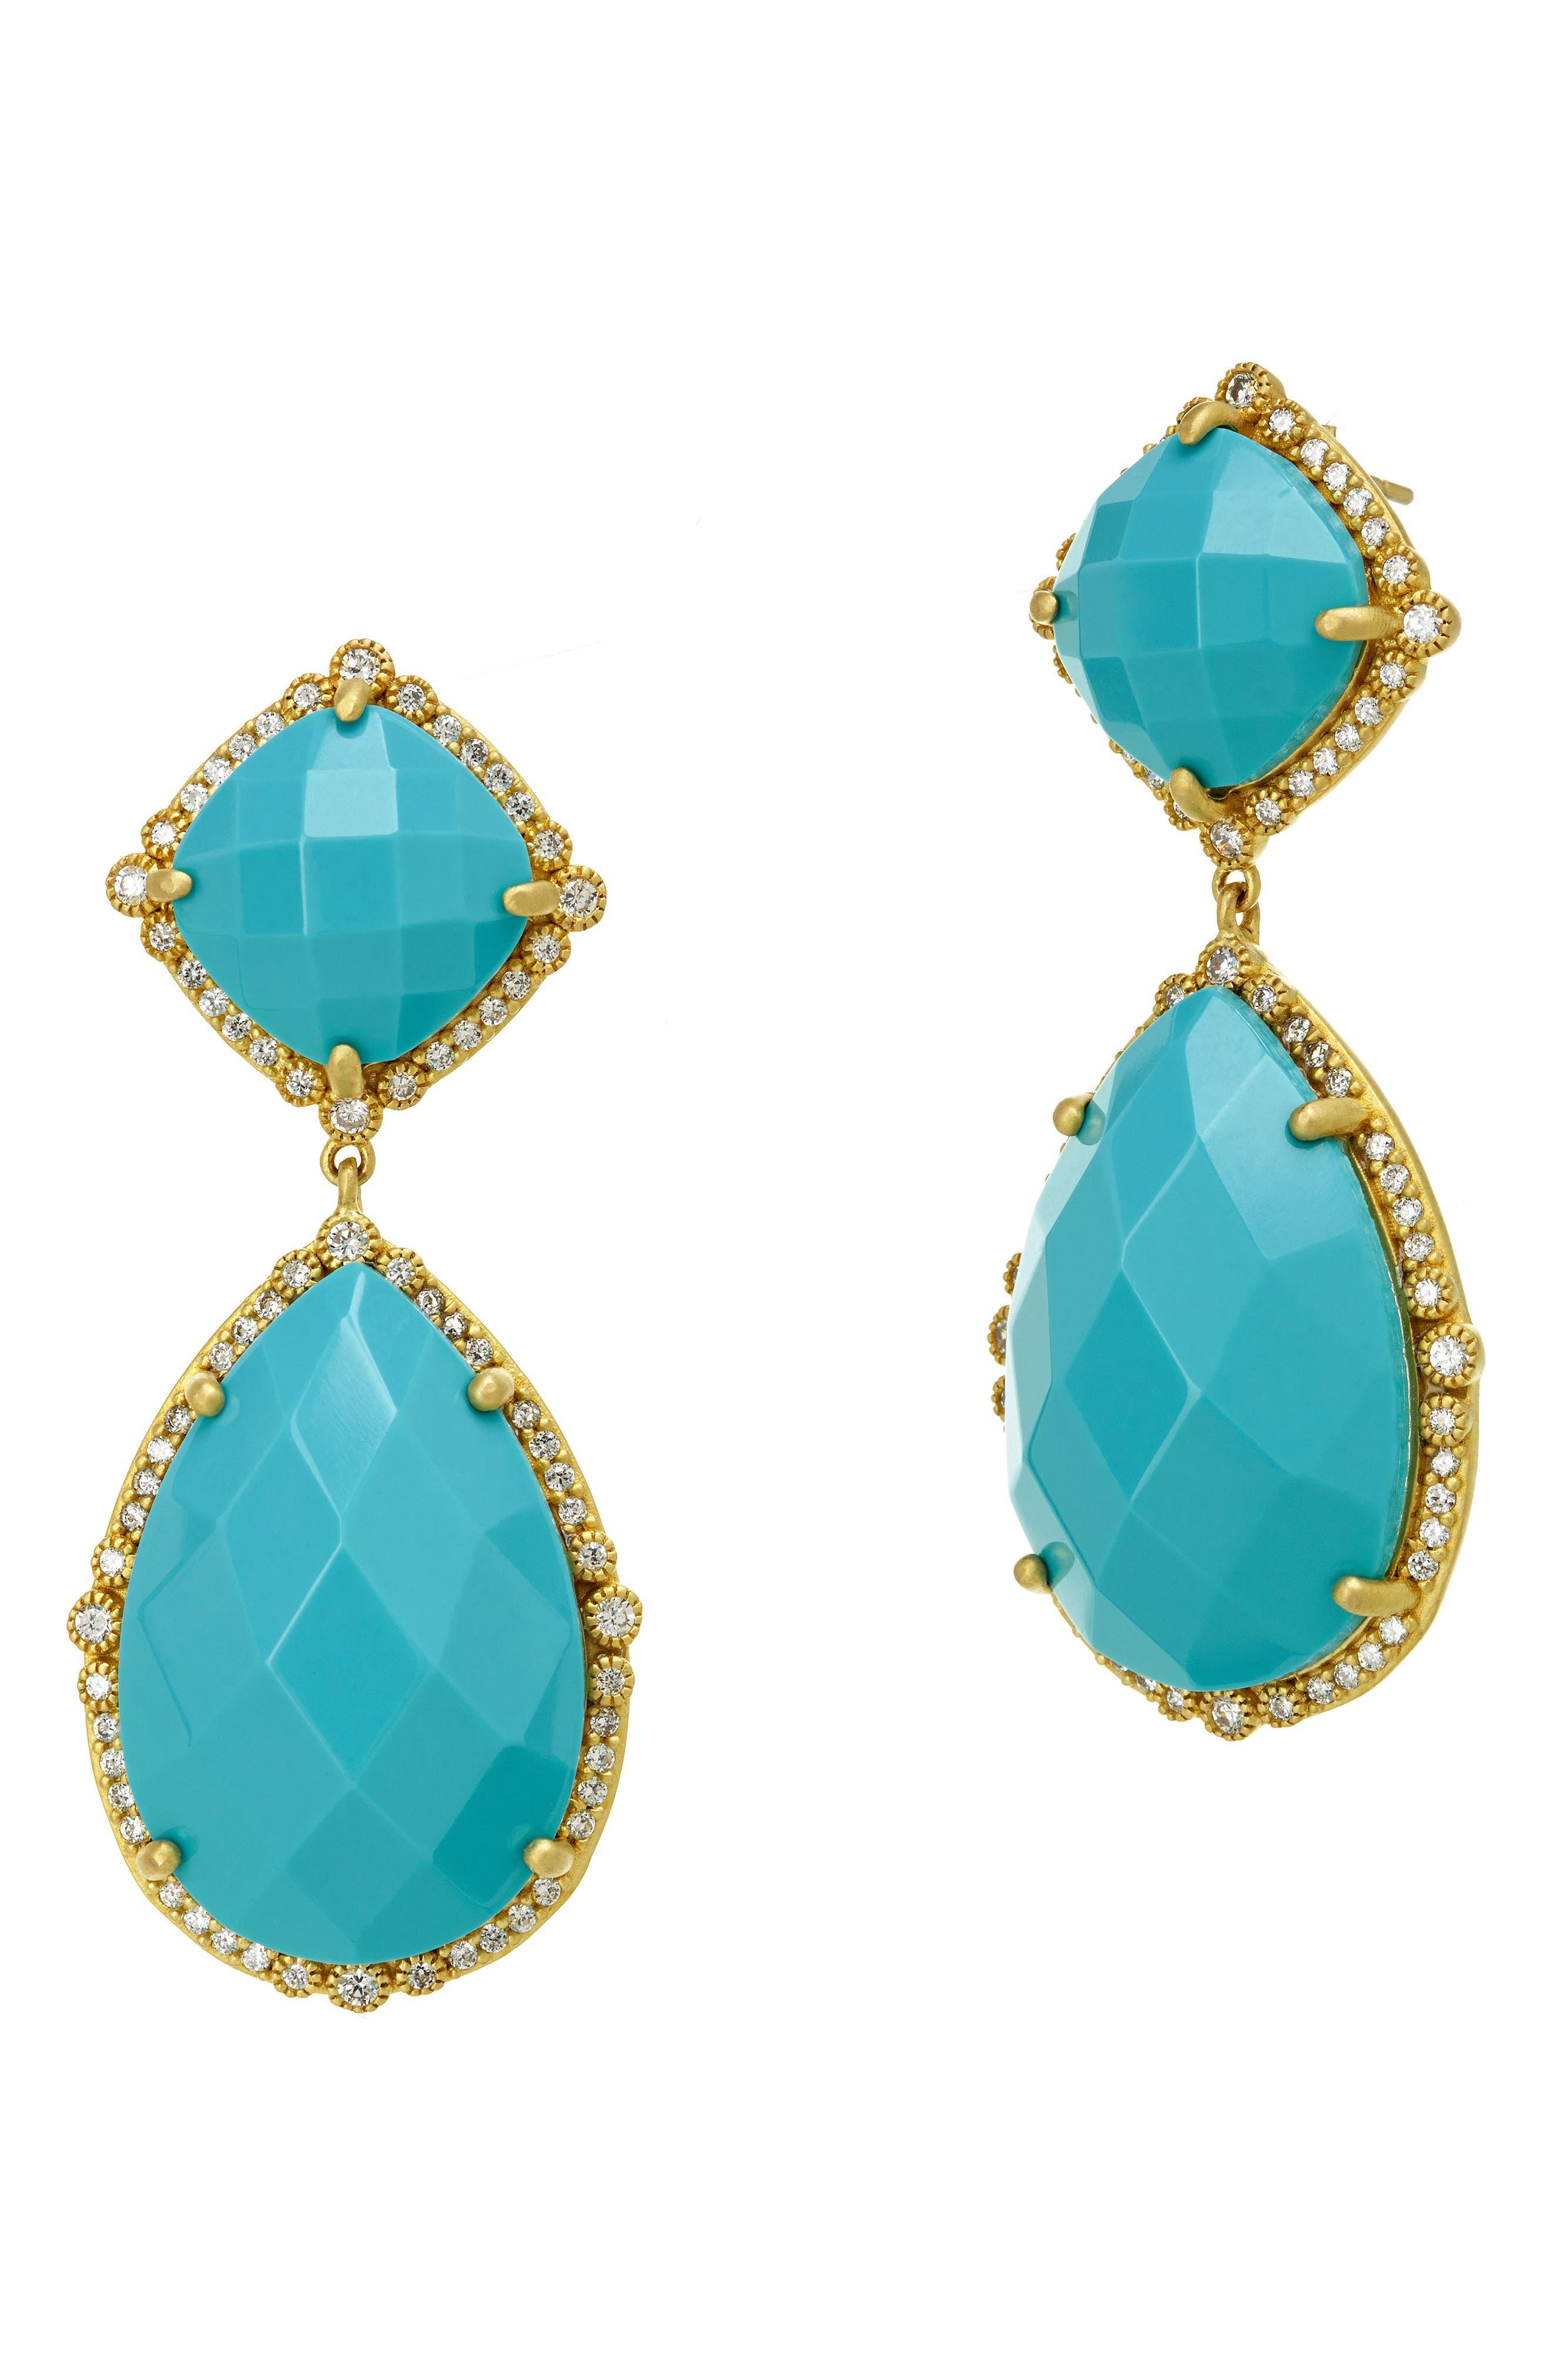 Main Image - FREIDA ROTHMAN 'Metropolitan' Stone Drop Earrings